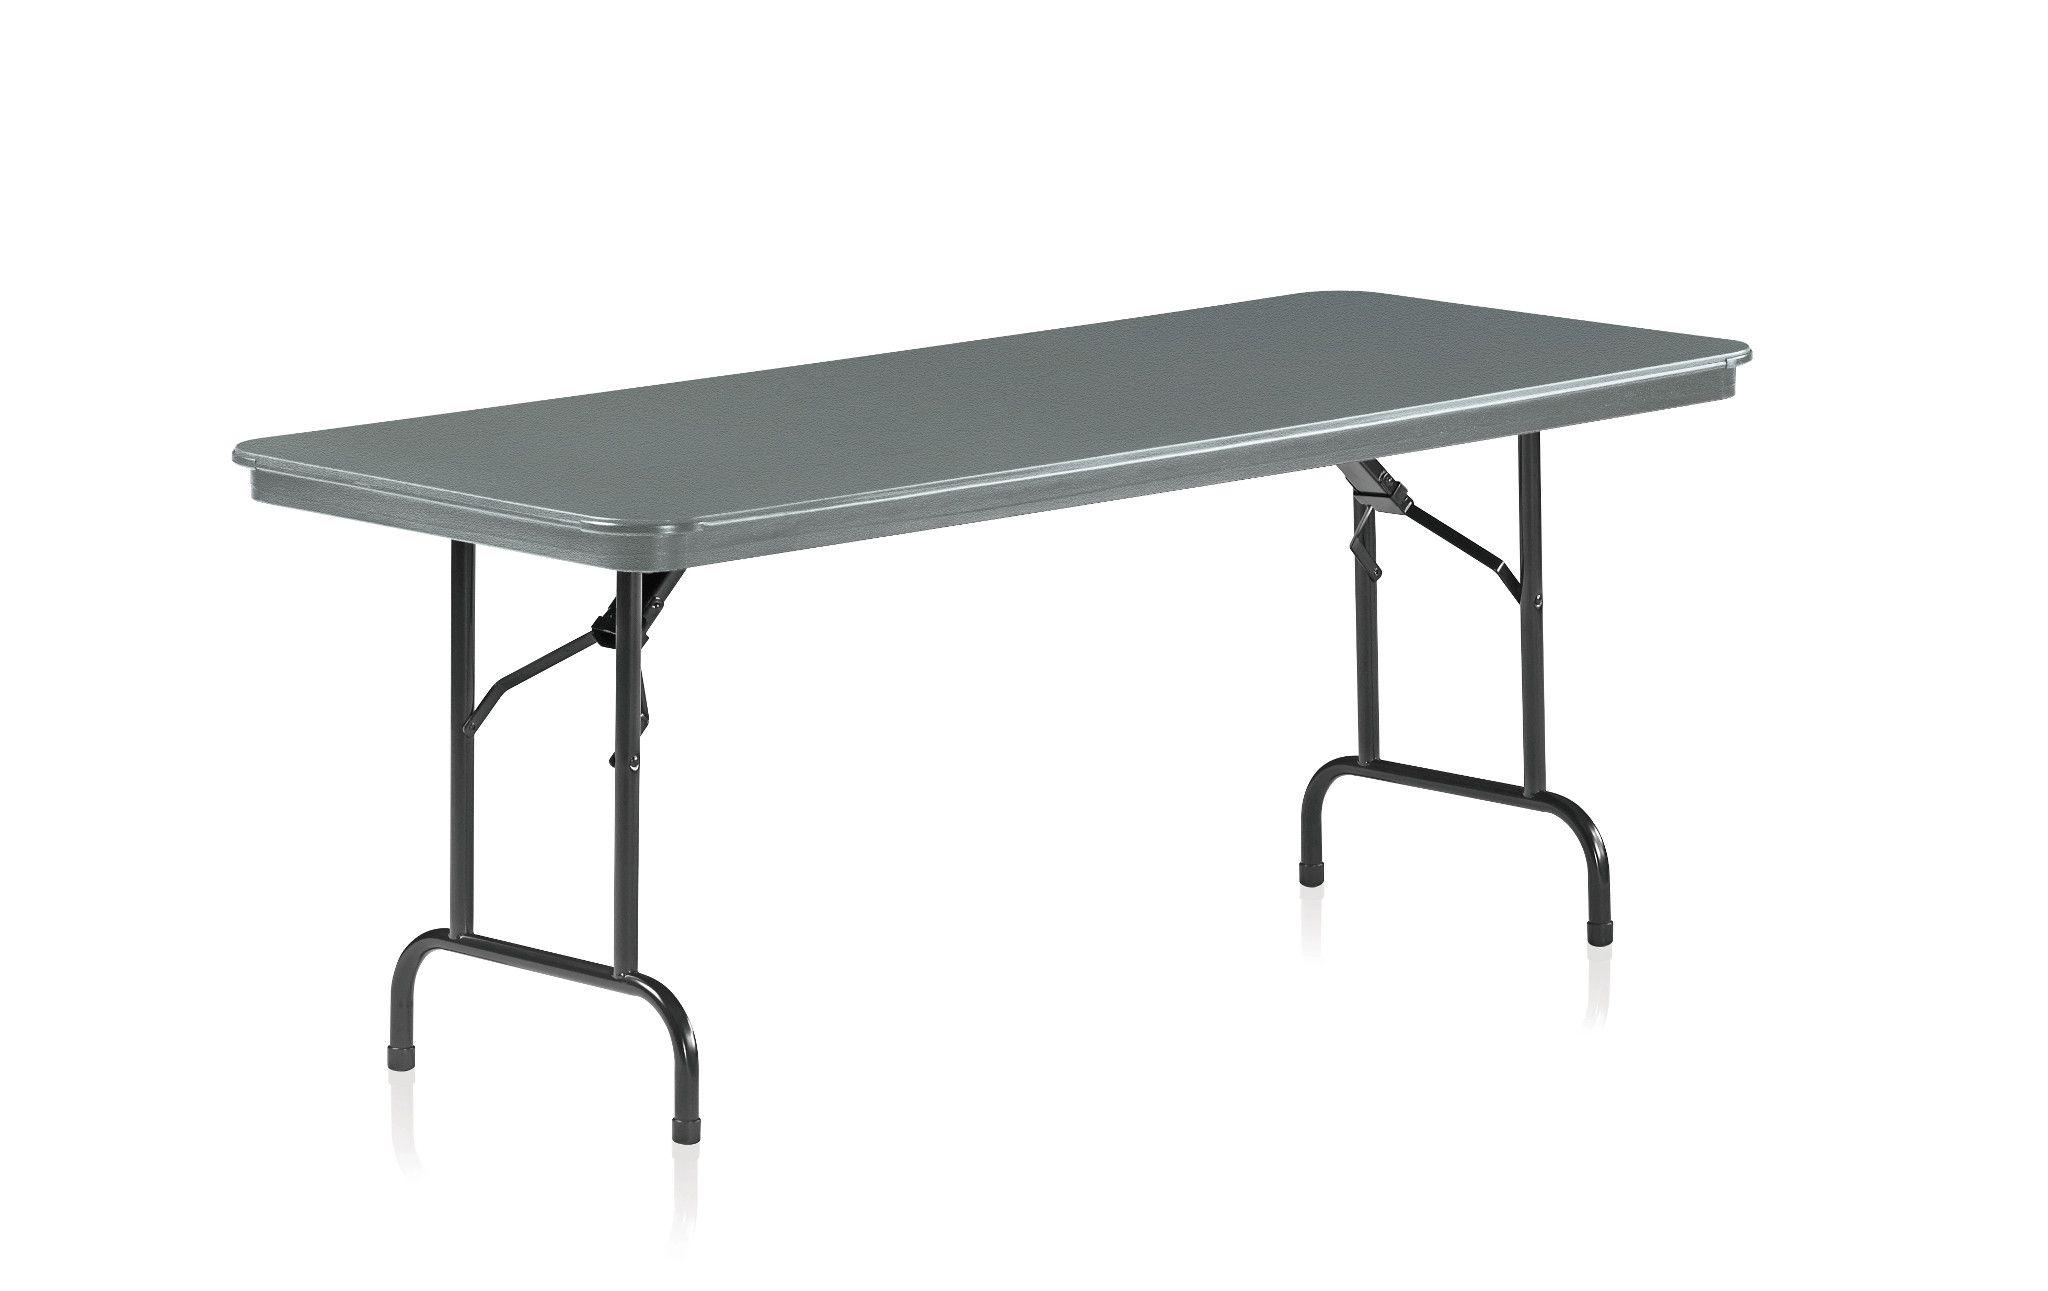 ki duralite folding table